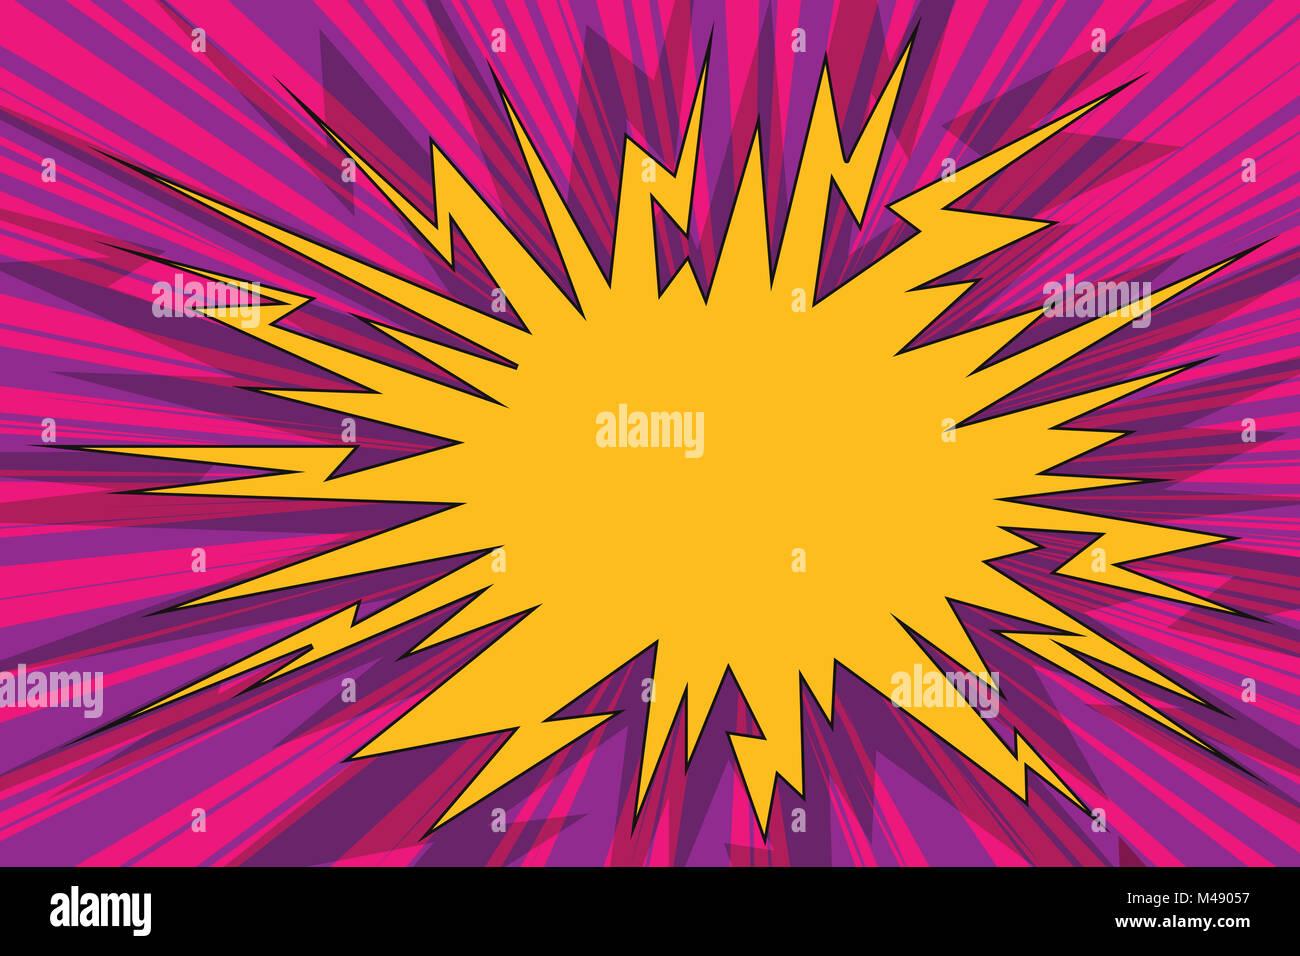 Explosive pop art background comics bubble - Stock Image